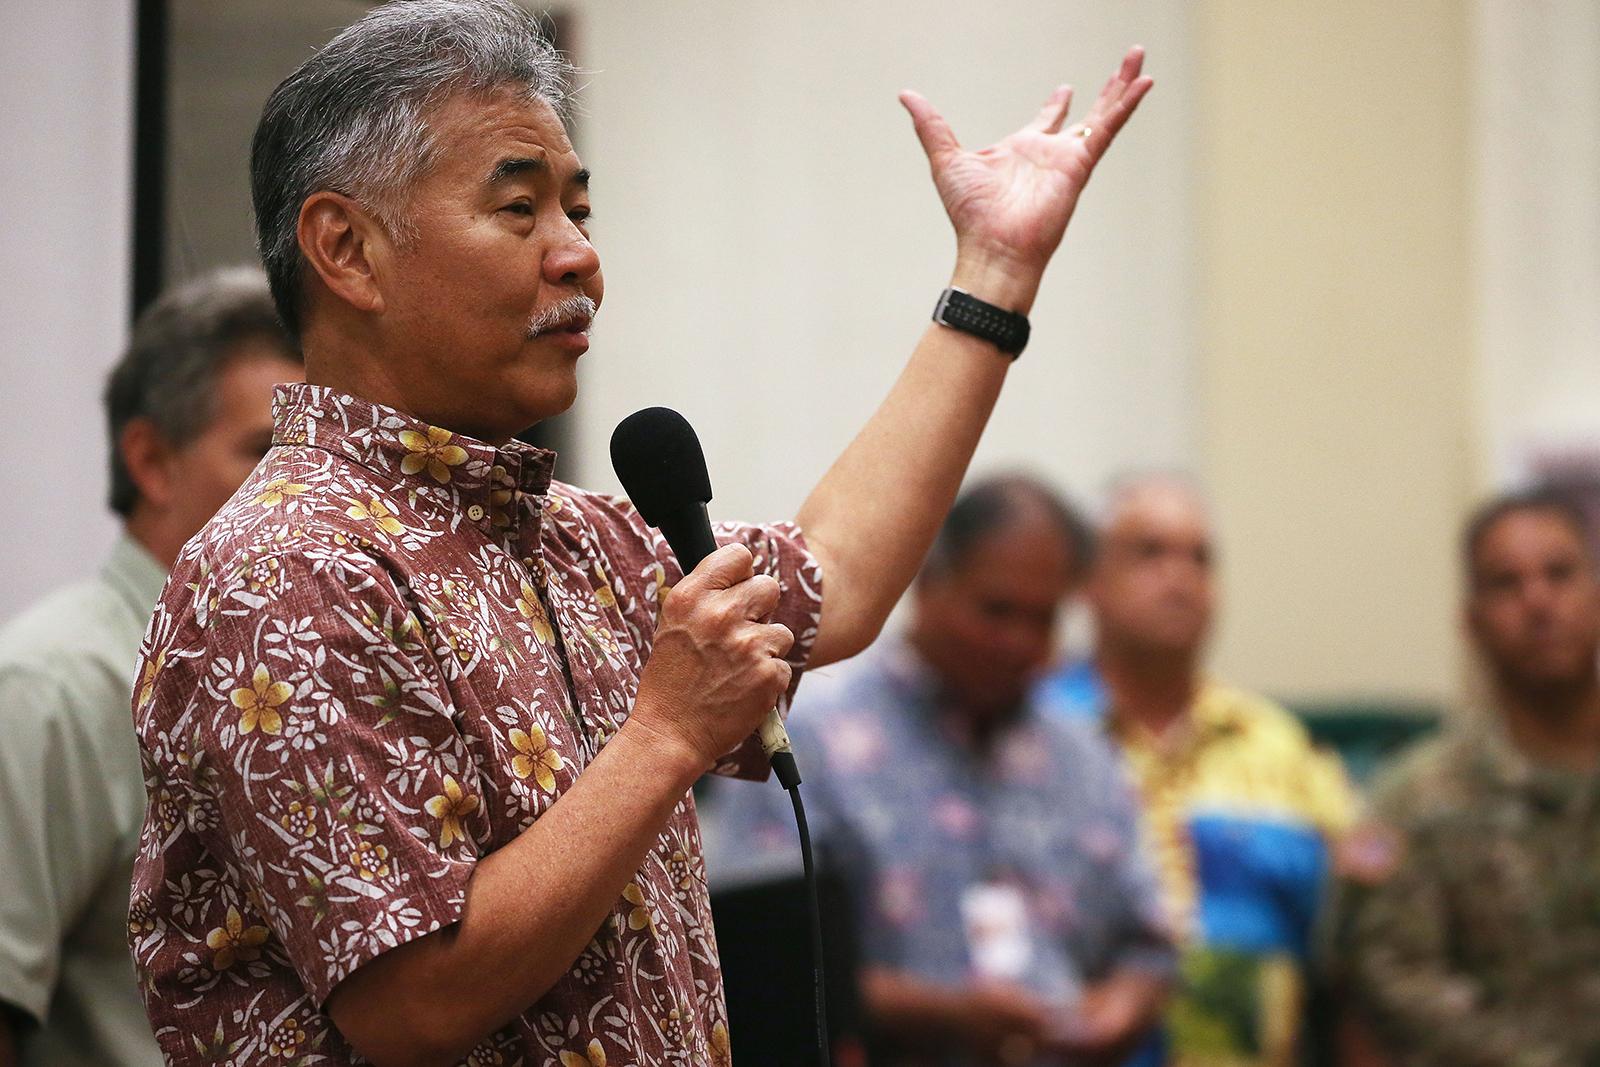 Hawaii Governor David Ige speaks at a community meeting in Pahoa, Hawaii, on May 7.